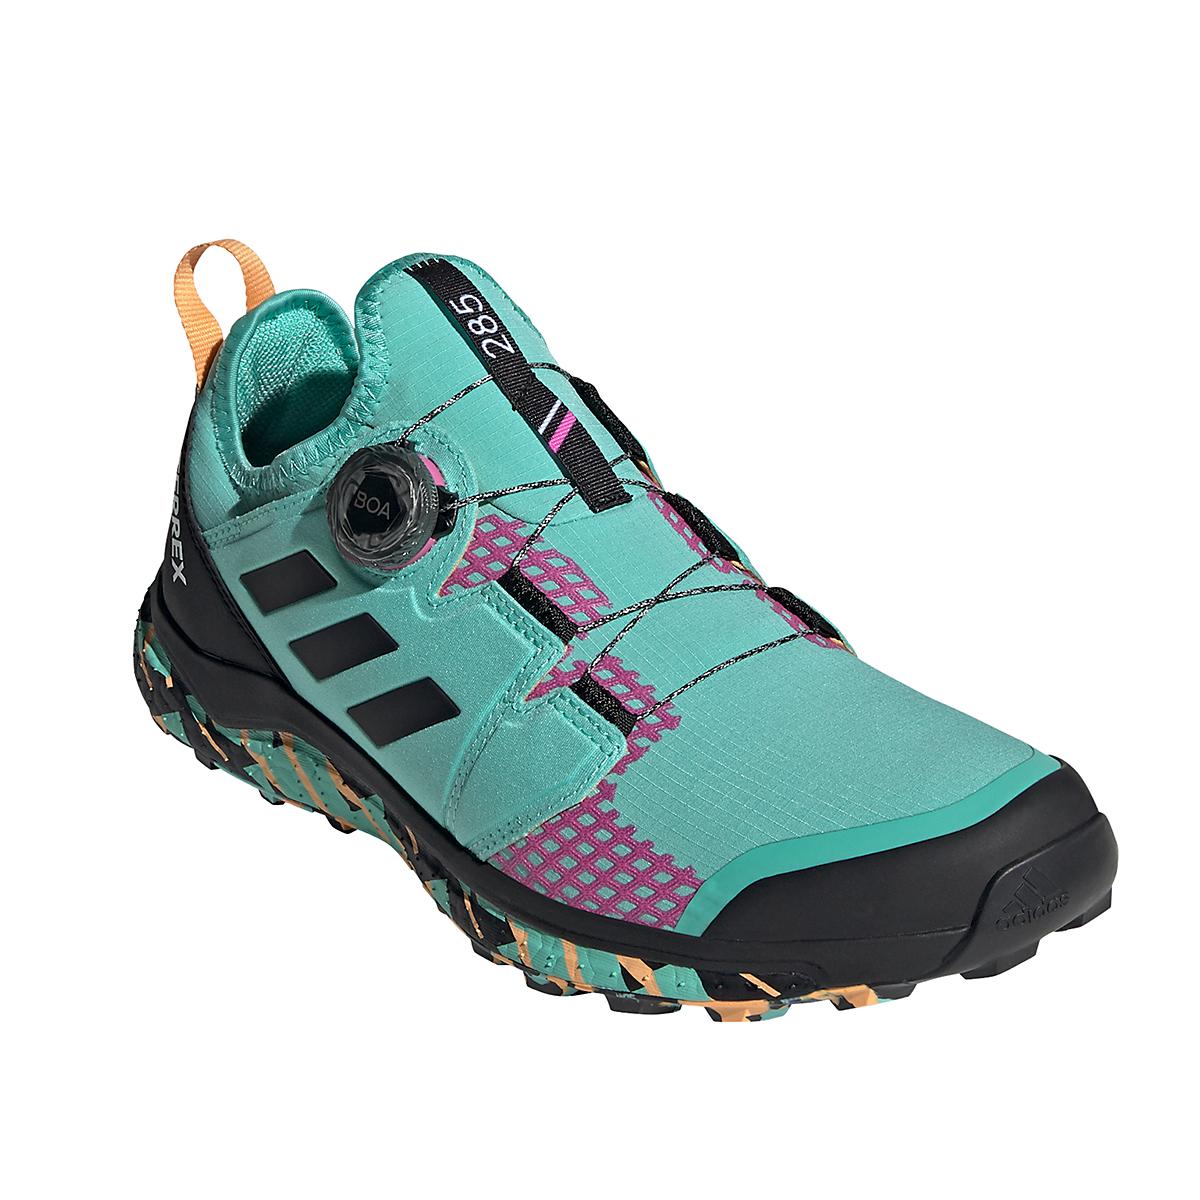 Men's Adidas Terrex Agravic BOA Trail Running Shoe - Color: Acid Mint/Core Black/Screaming Pink - Size: 6 - Width: Regular, Acid Mint/Core Black/Screaming Pink, large, image 3